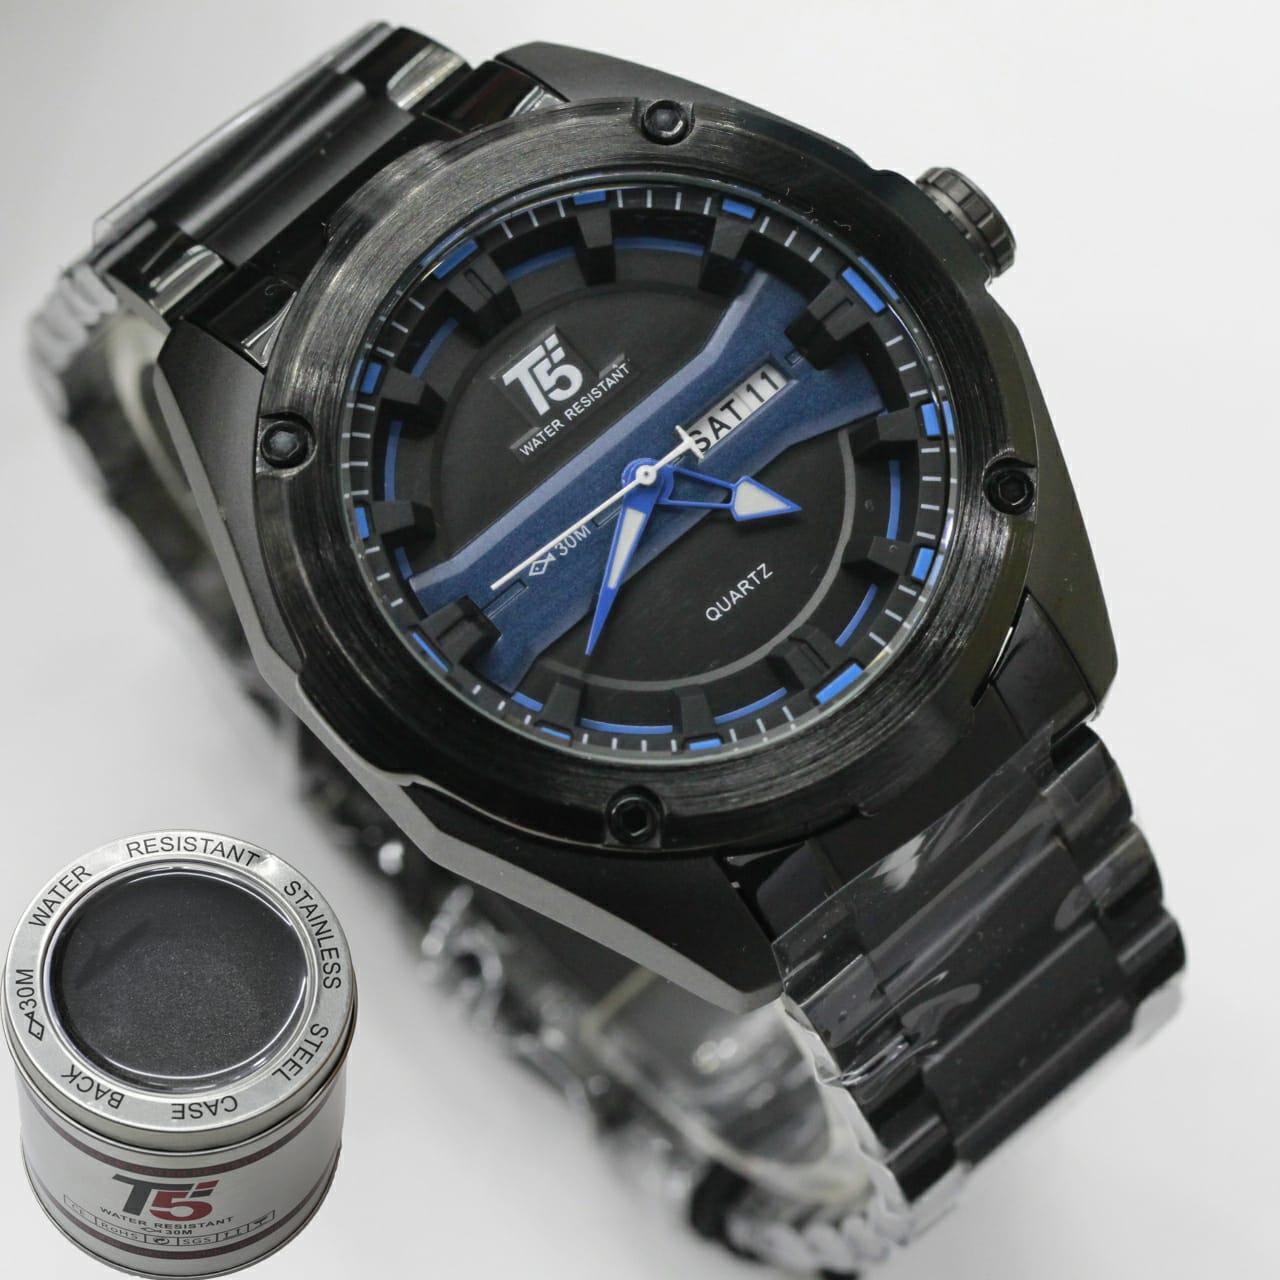 Swatch Jam Tangan Pria Silver Hitam Strap Coklat Tua Yvs400 Spec Original 100  Yvs424 Disorderly Chrono Putih A15549g Source